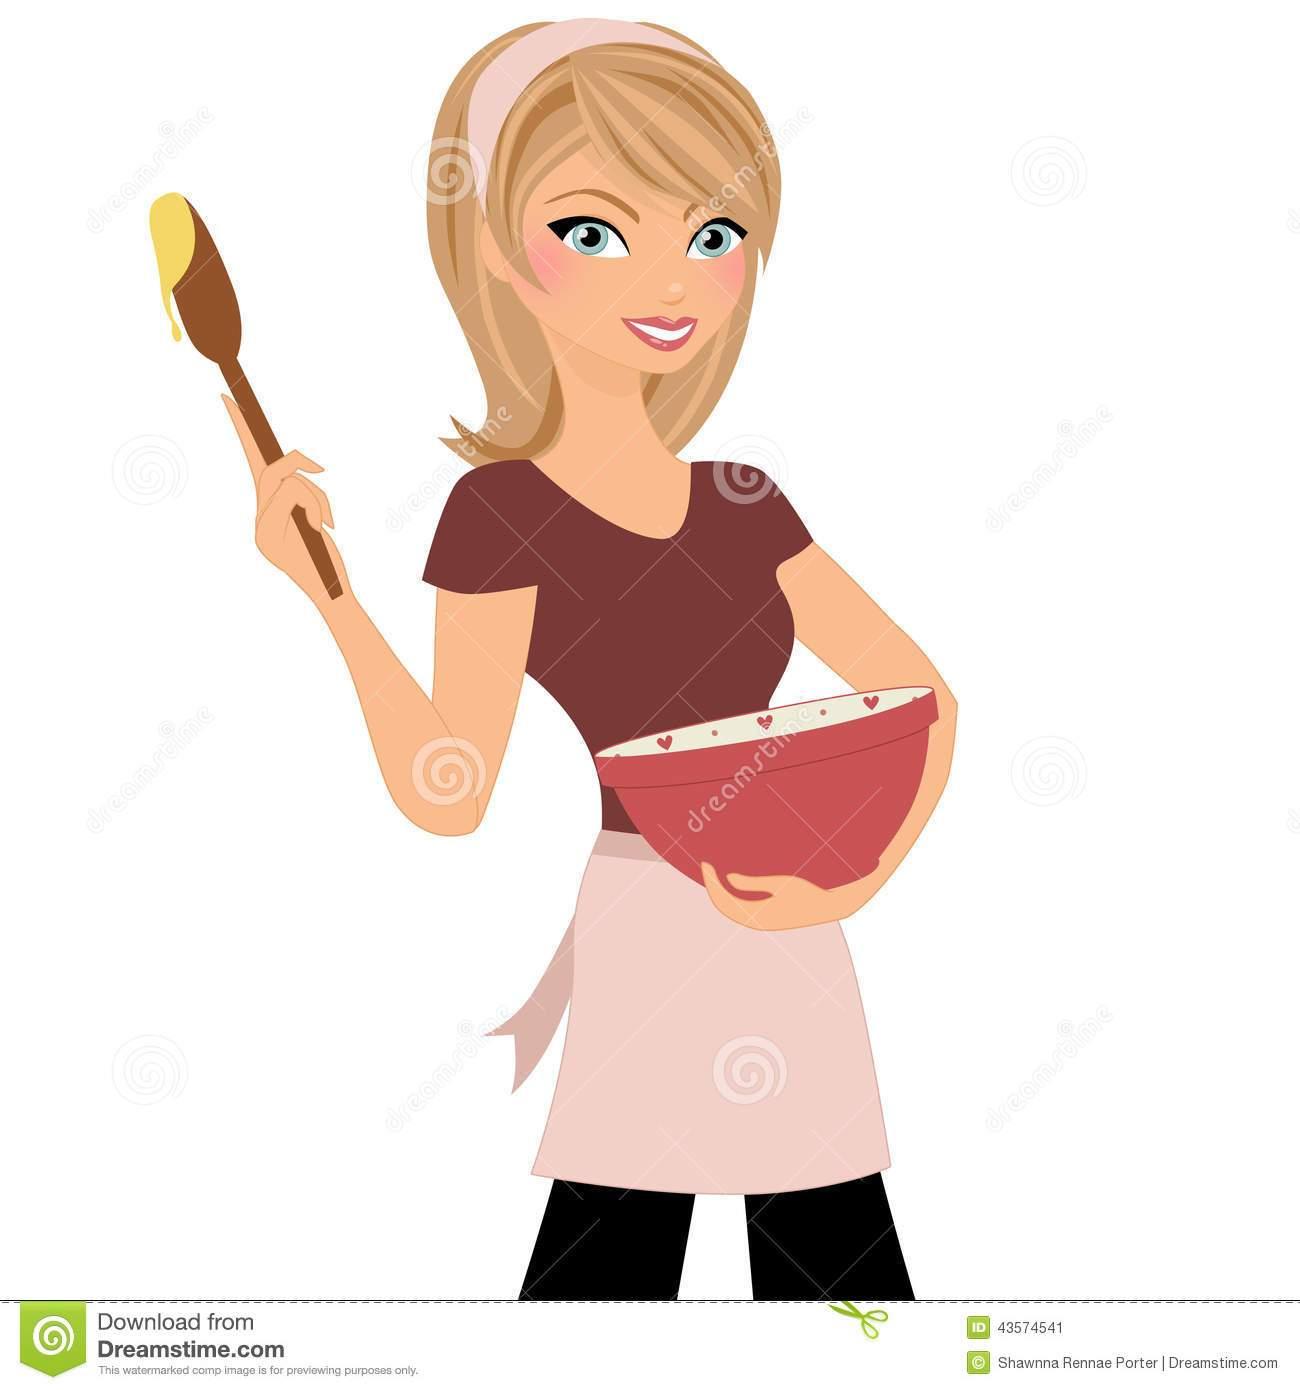 Woman baker clipart jpg royalty free Woman baker clipart 8 » Clipart Portal jpg royalty free